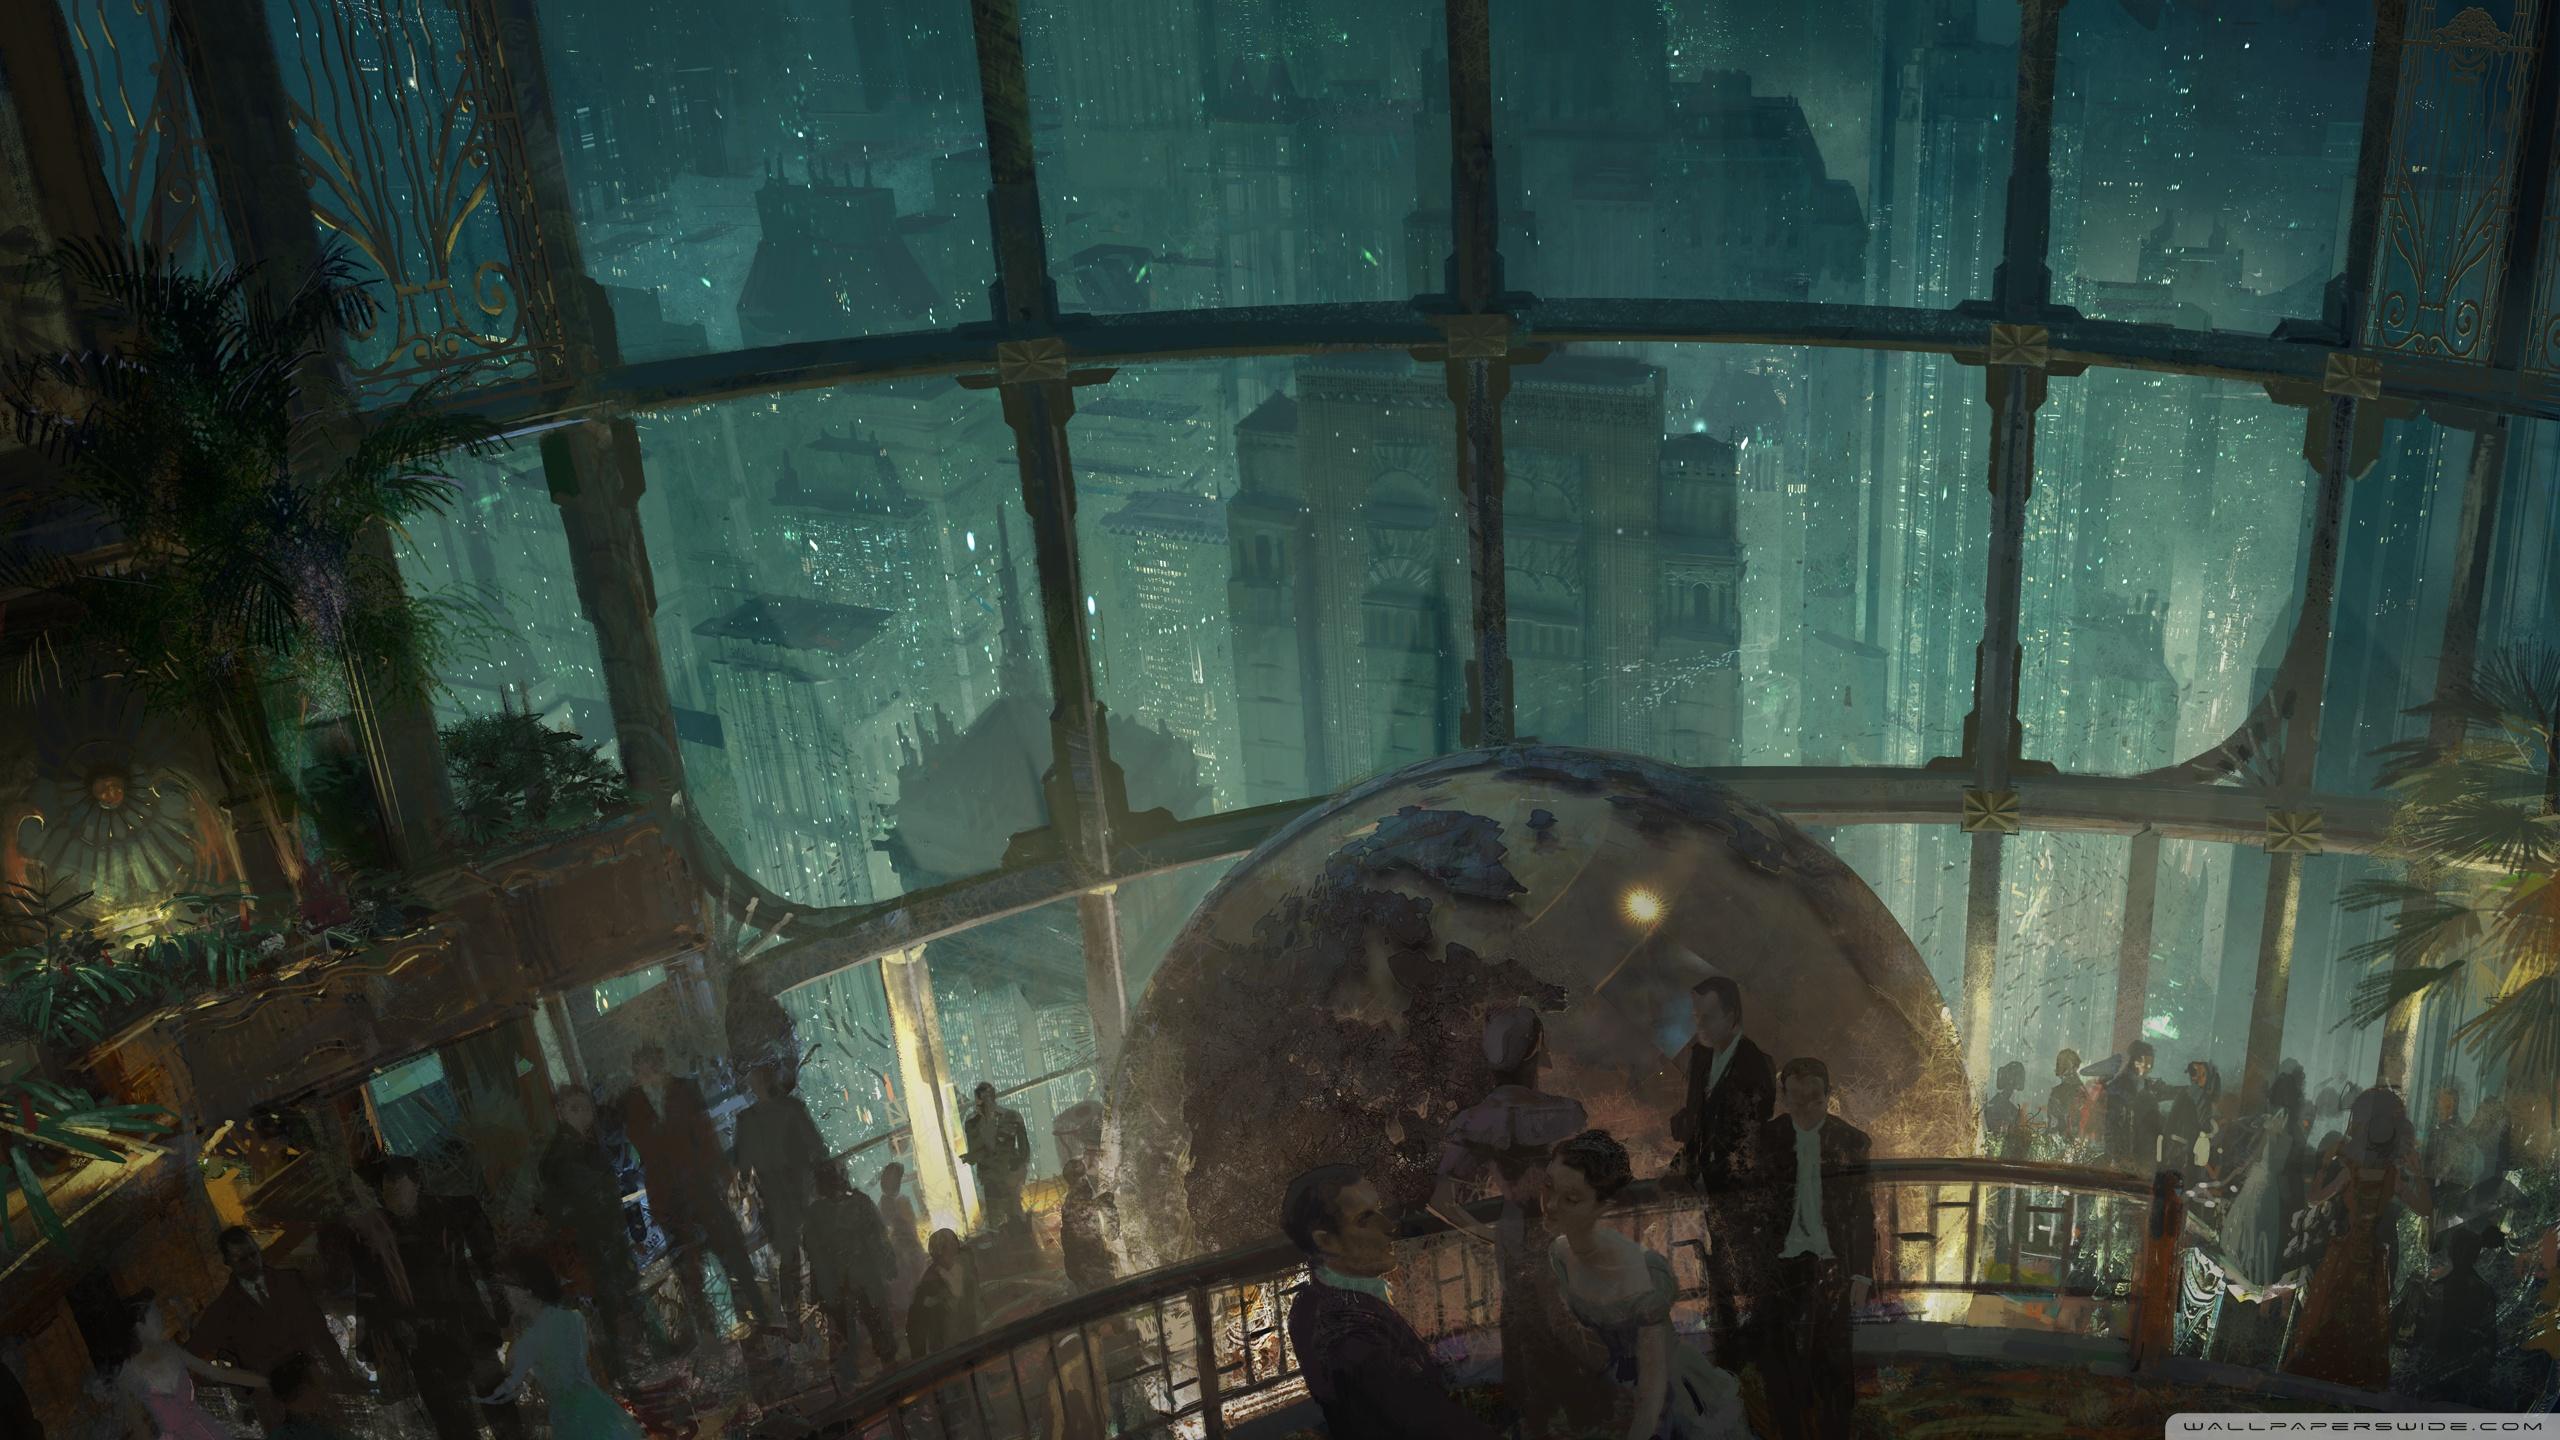 Video Game Art, retro science fiction